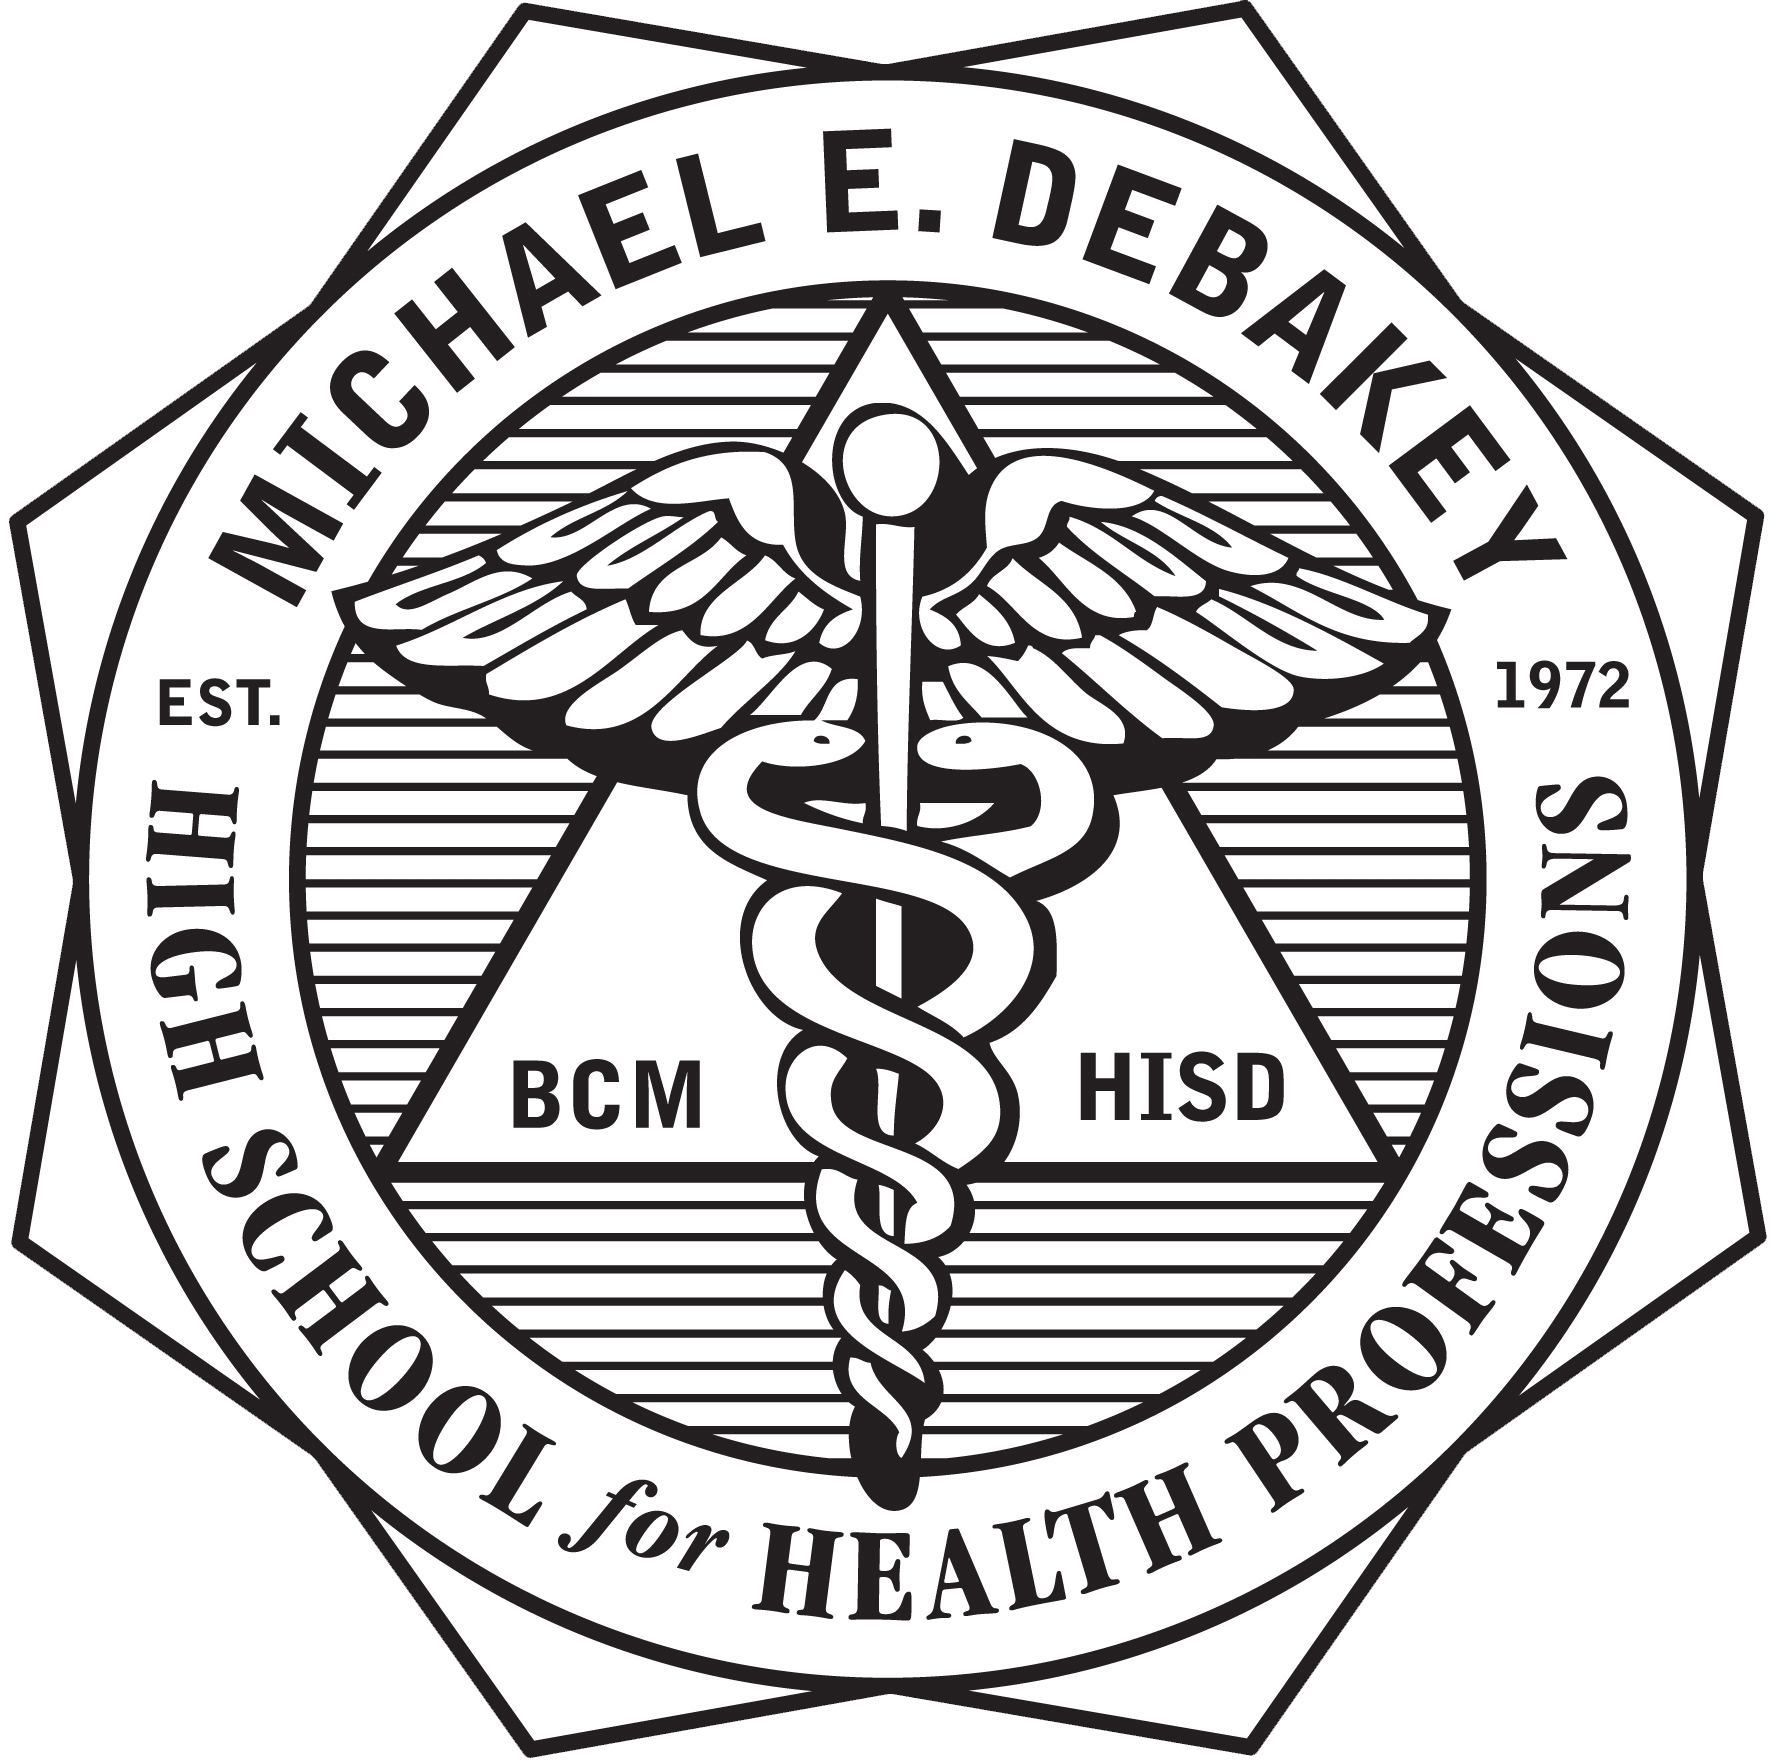 Debakey High School For Health Professions / Homepage intended for School Year Calendar 2019-2020   Michael E. Debakey High